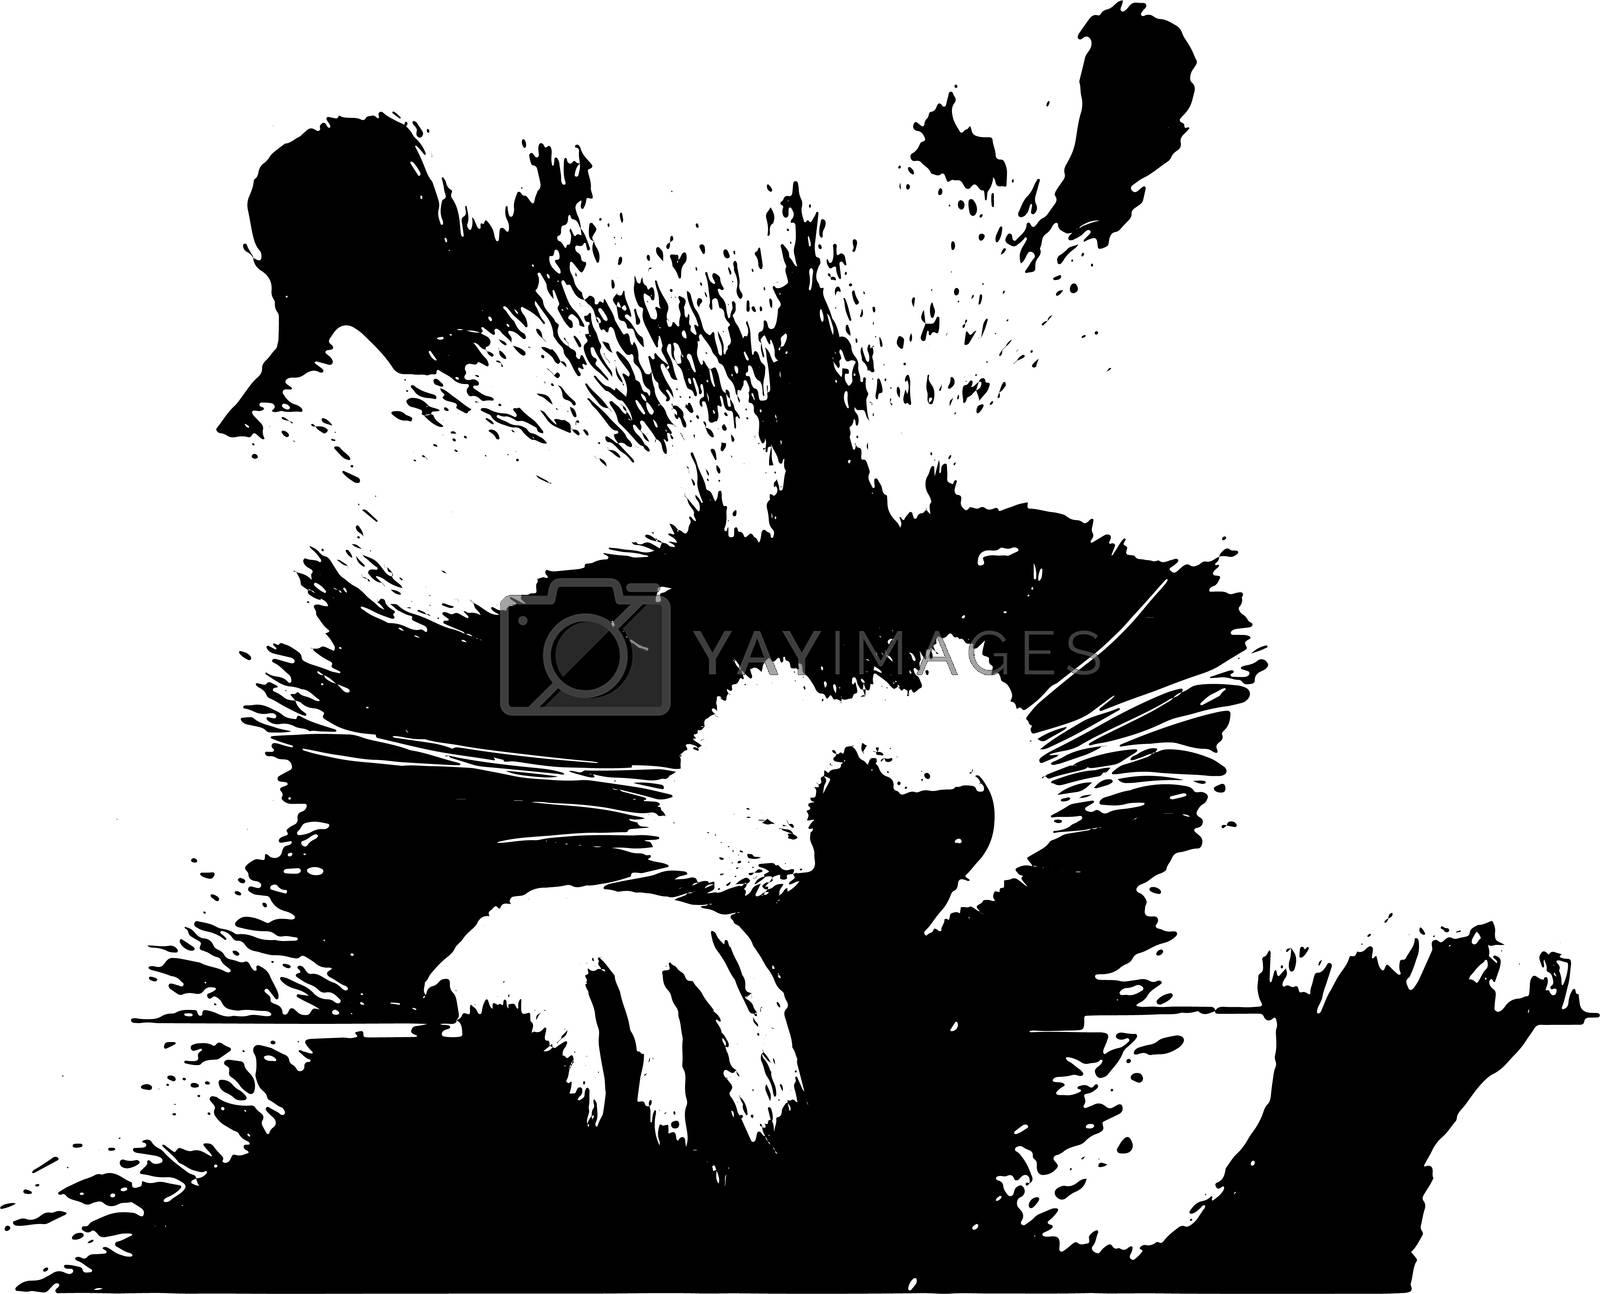 A sweet little racoon - Illustration